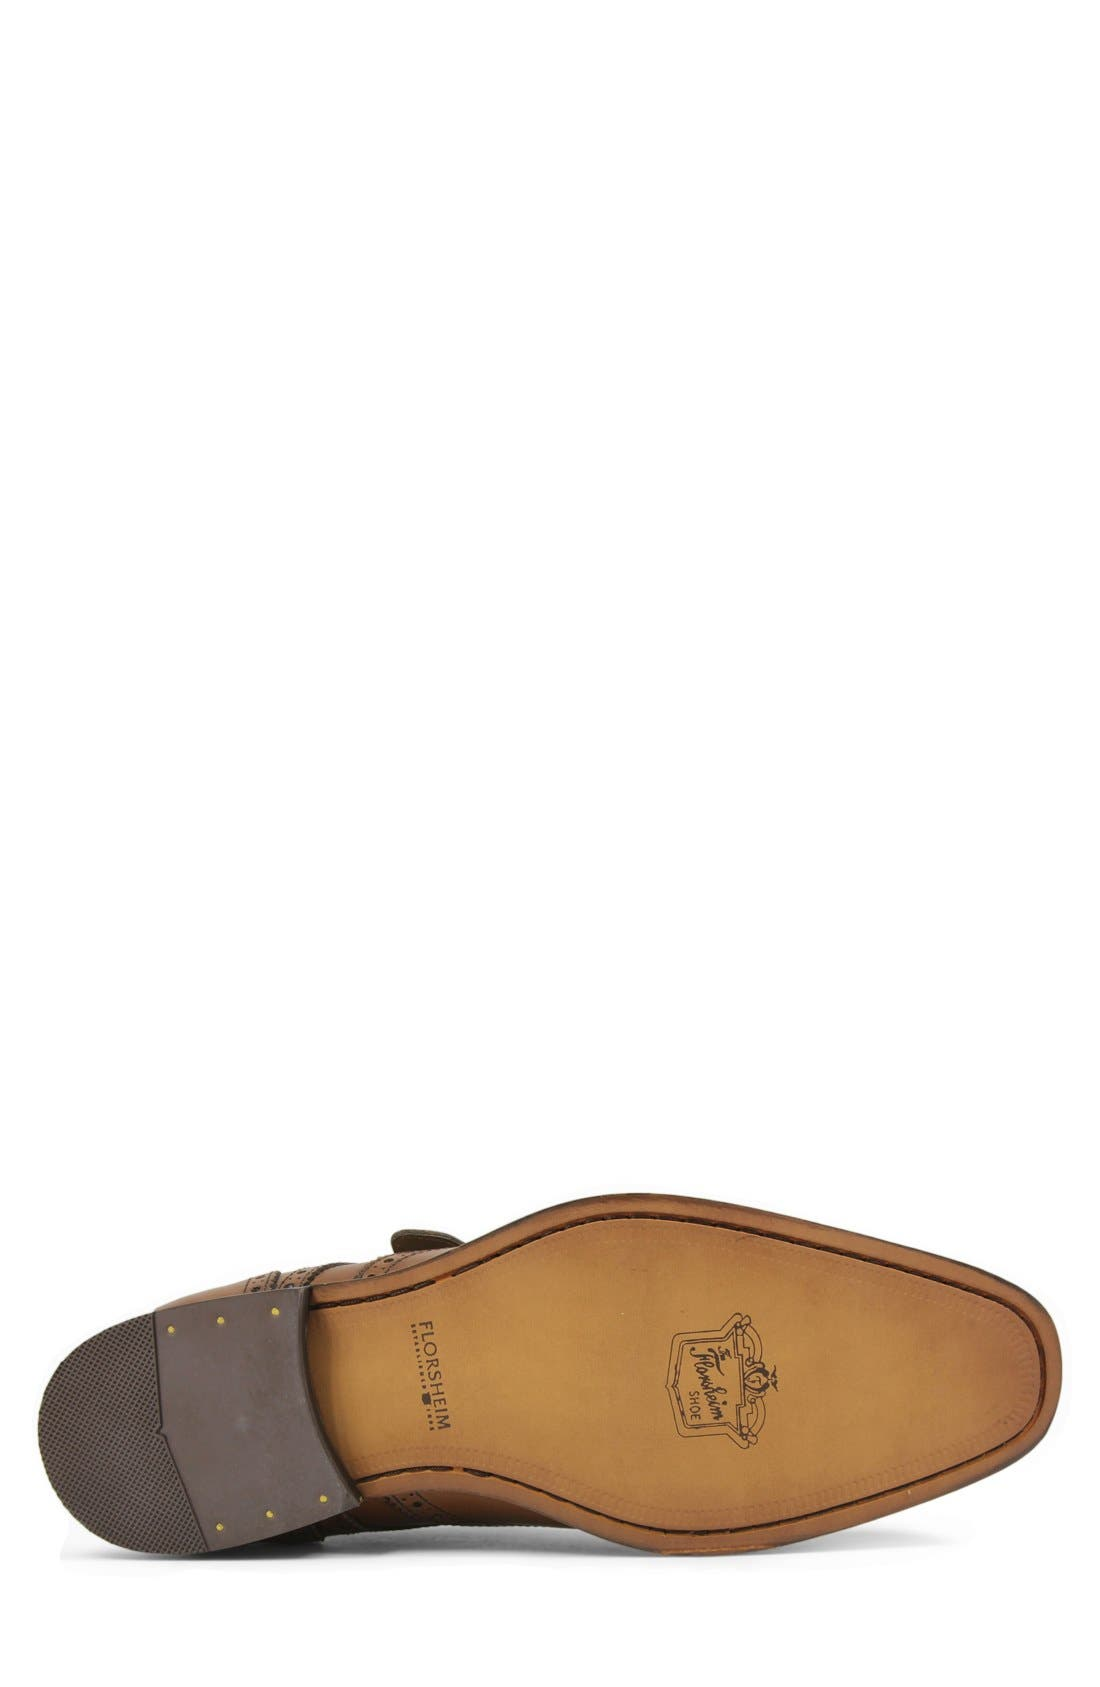 'Sabato' Wingtip Monk Strap Shoe,                             Alternate thumbnail 4, color,                             MEDIUM BROWN